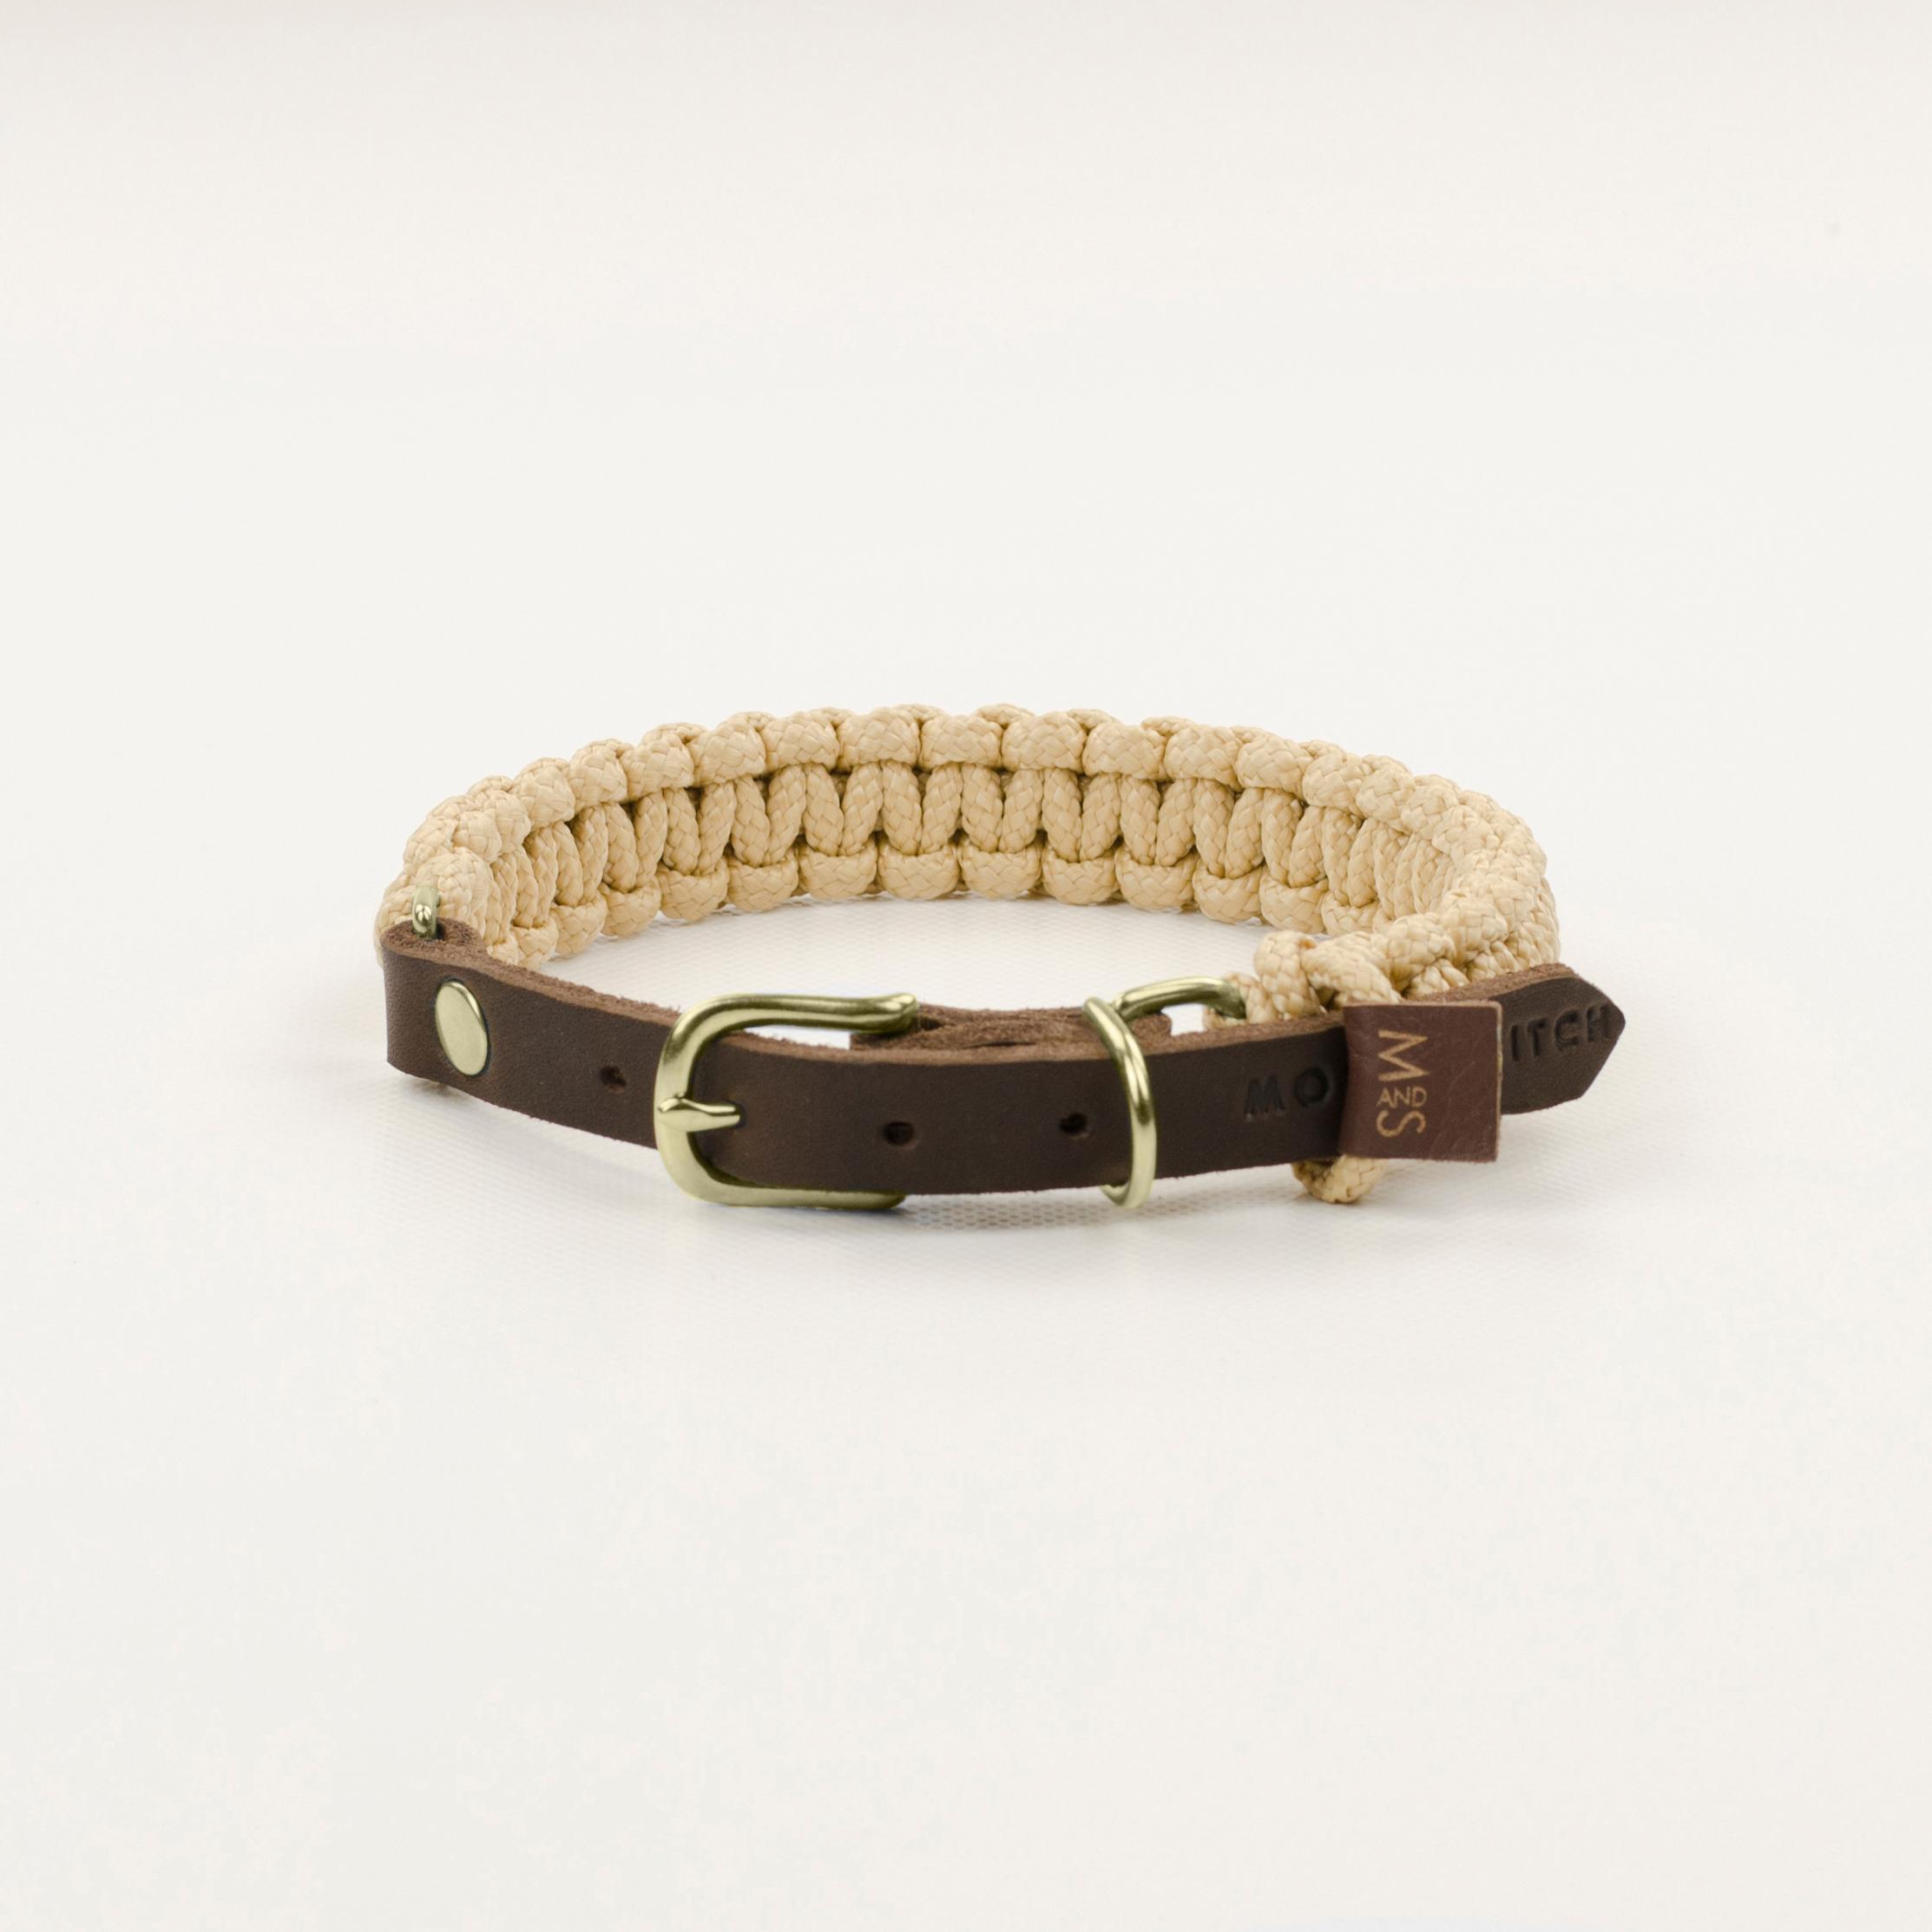 Hundehalsband Gold  touch-of-leather-hundehalsband-beige